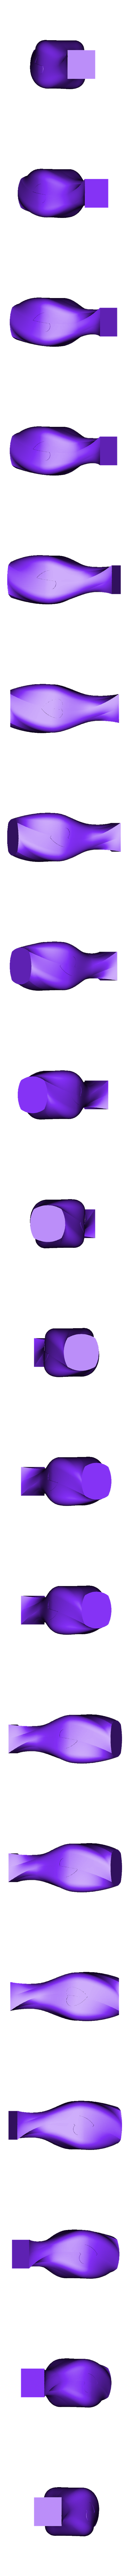 twoHalvesVase.stl Download free STL file Valentines Heart Vases • 3D printing design, Thomllama